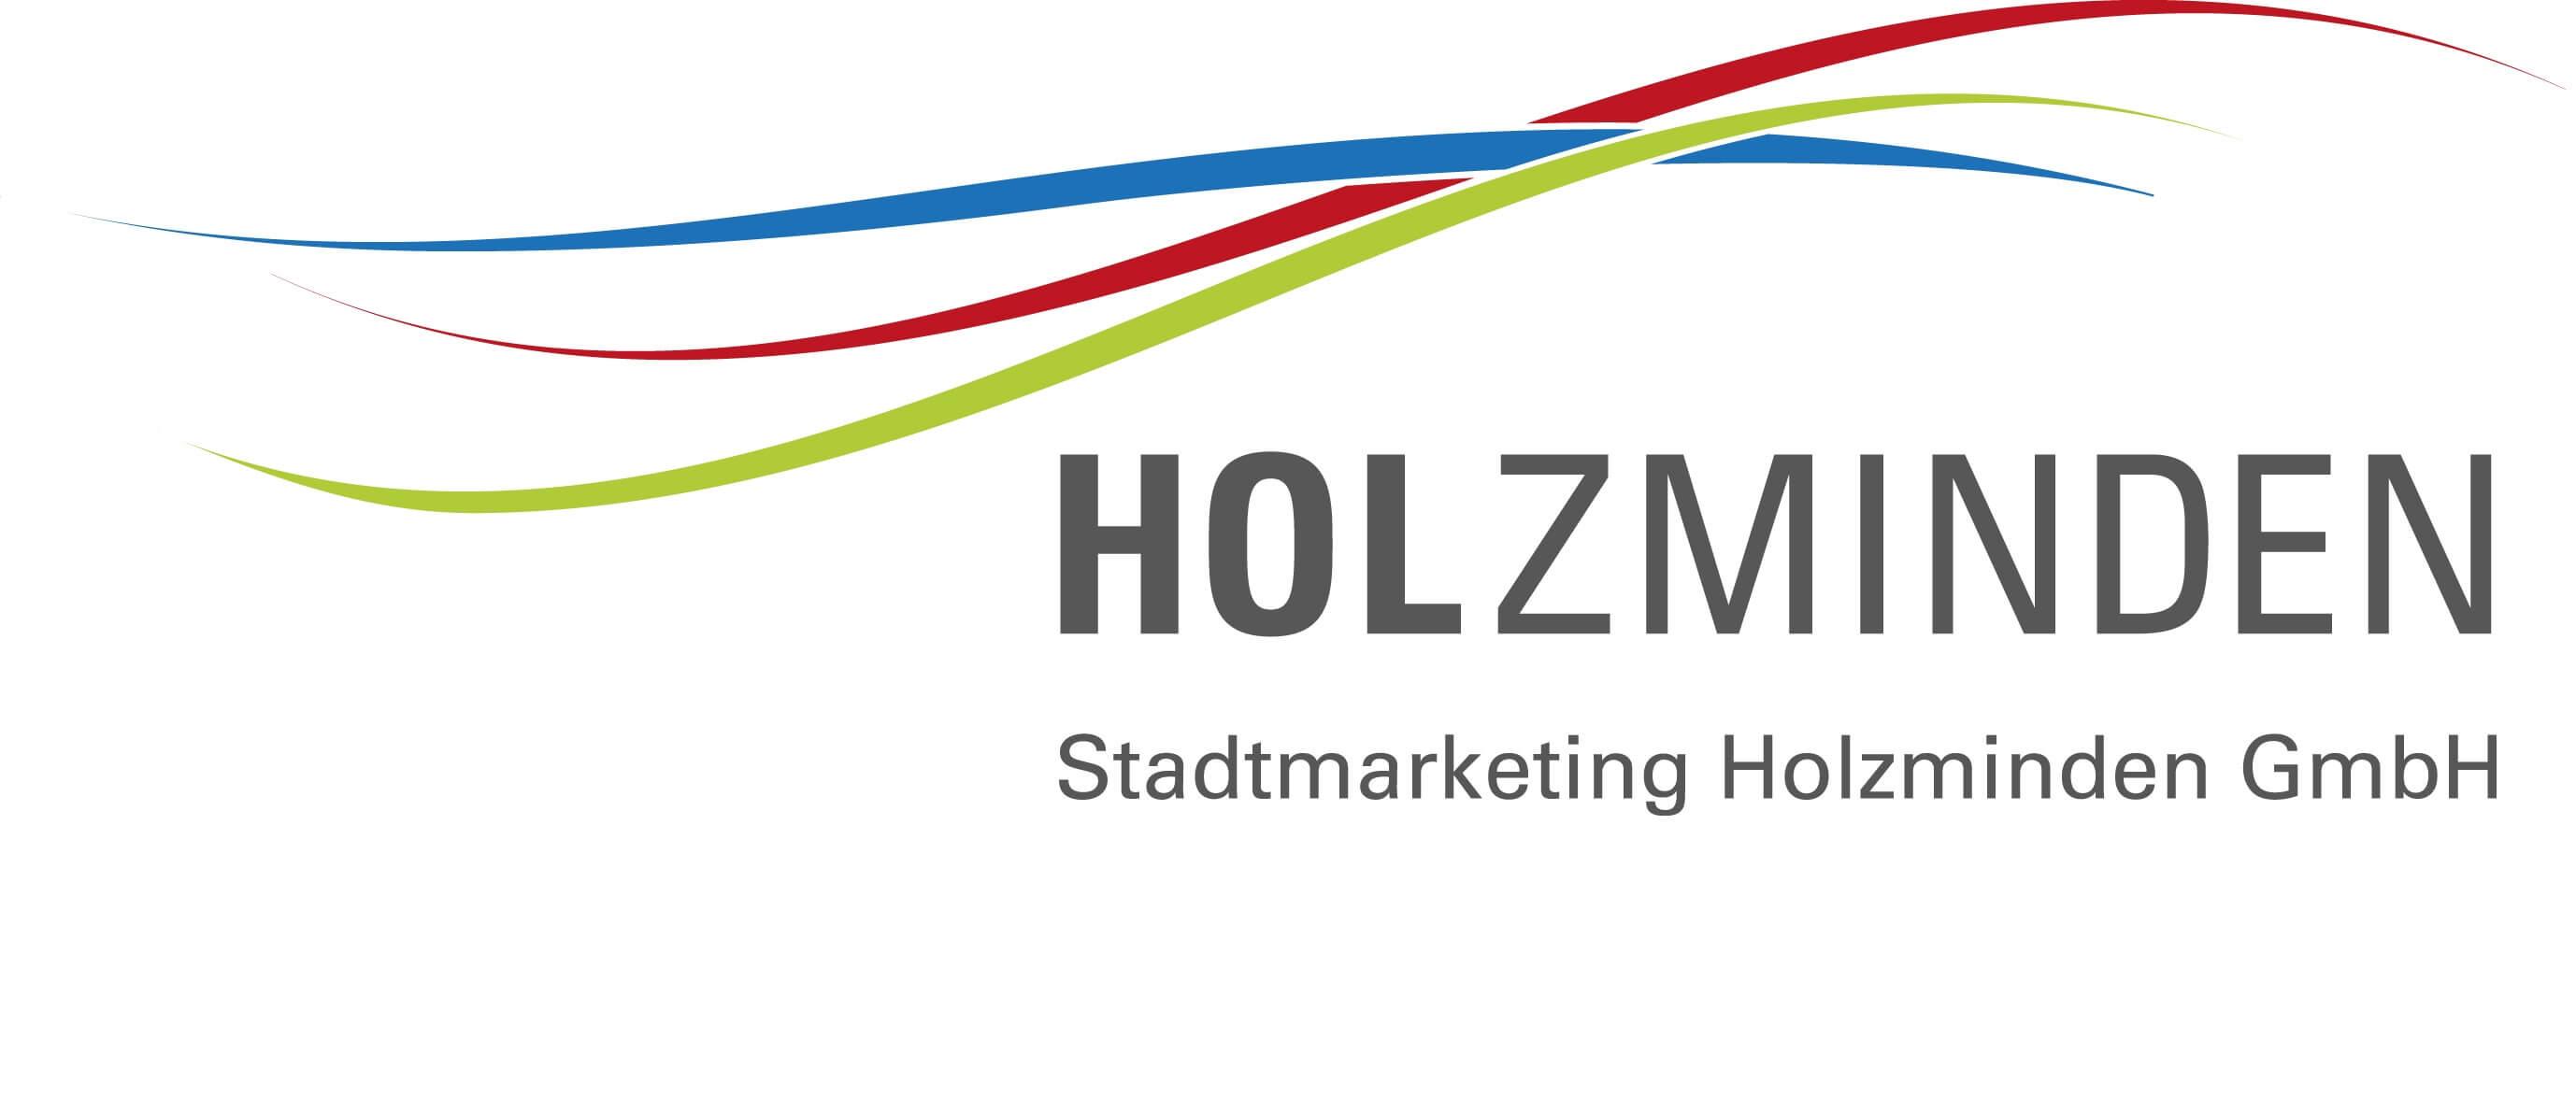 Holzminden Logo 2014 Stadtmarketing RGB 233mmx82mm 300dpi neu